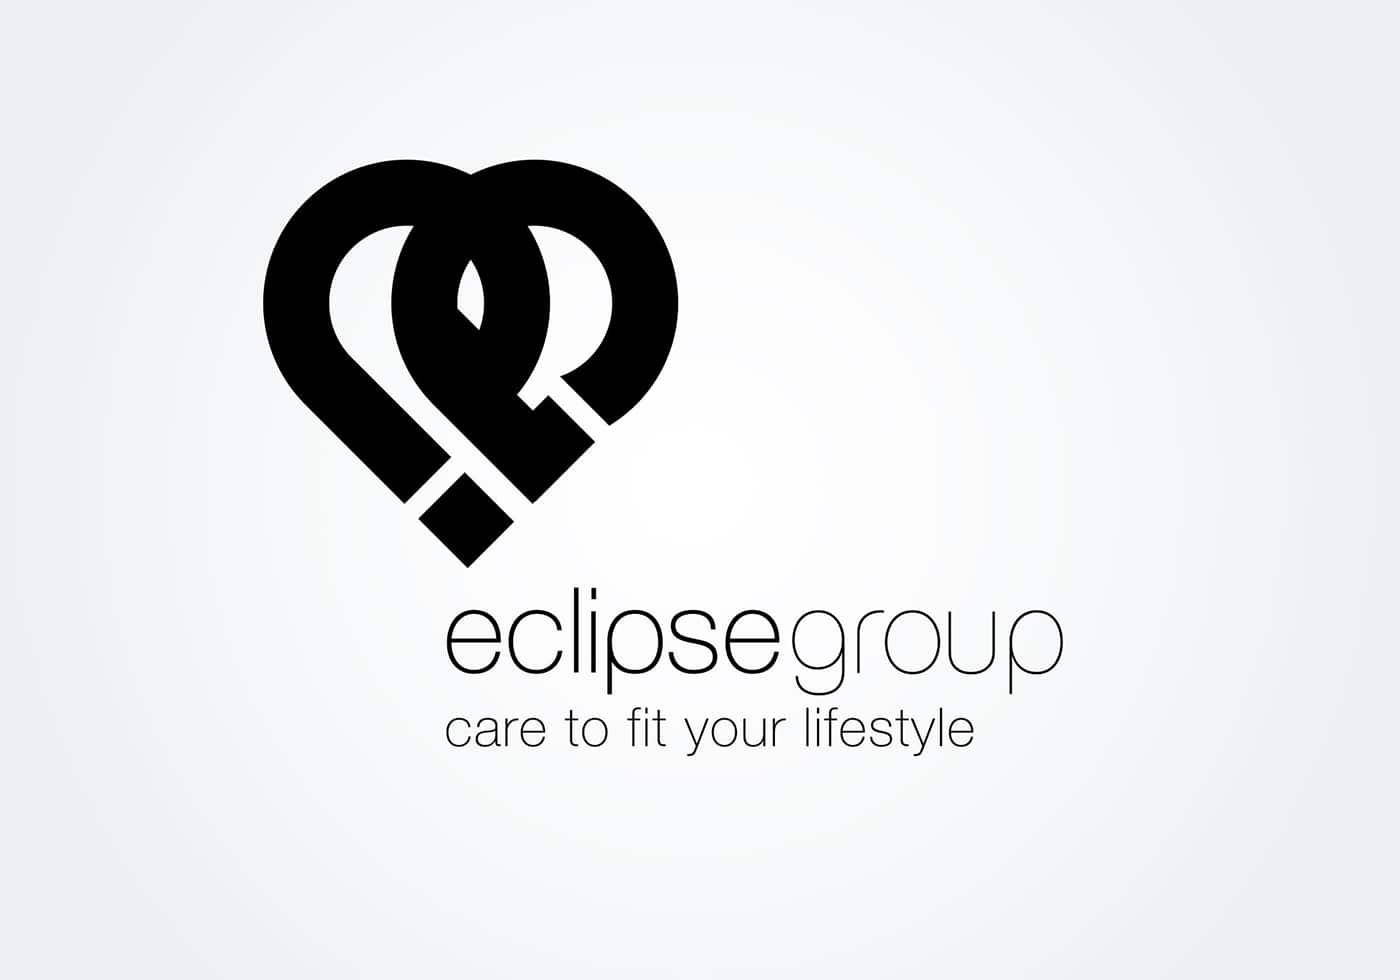 Eclipse Care Group logo design black and white